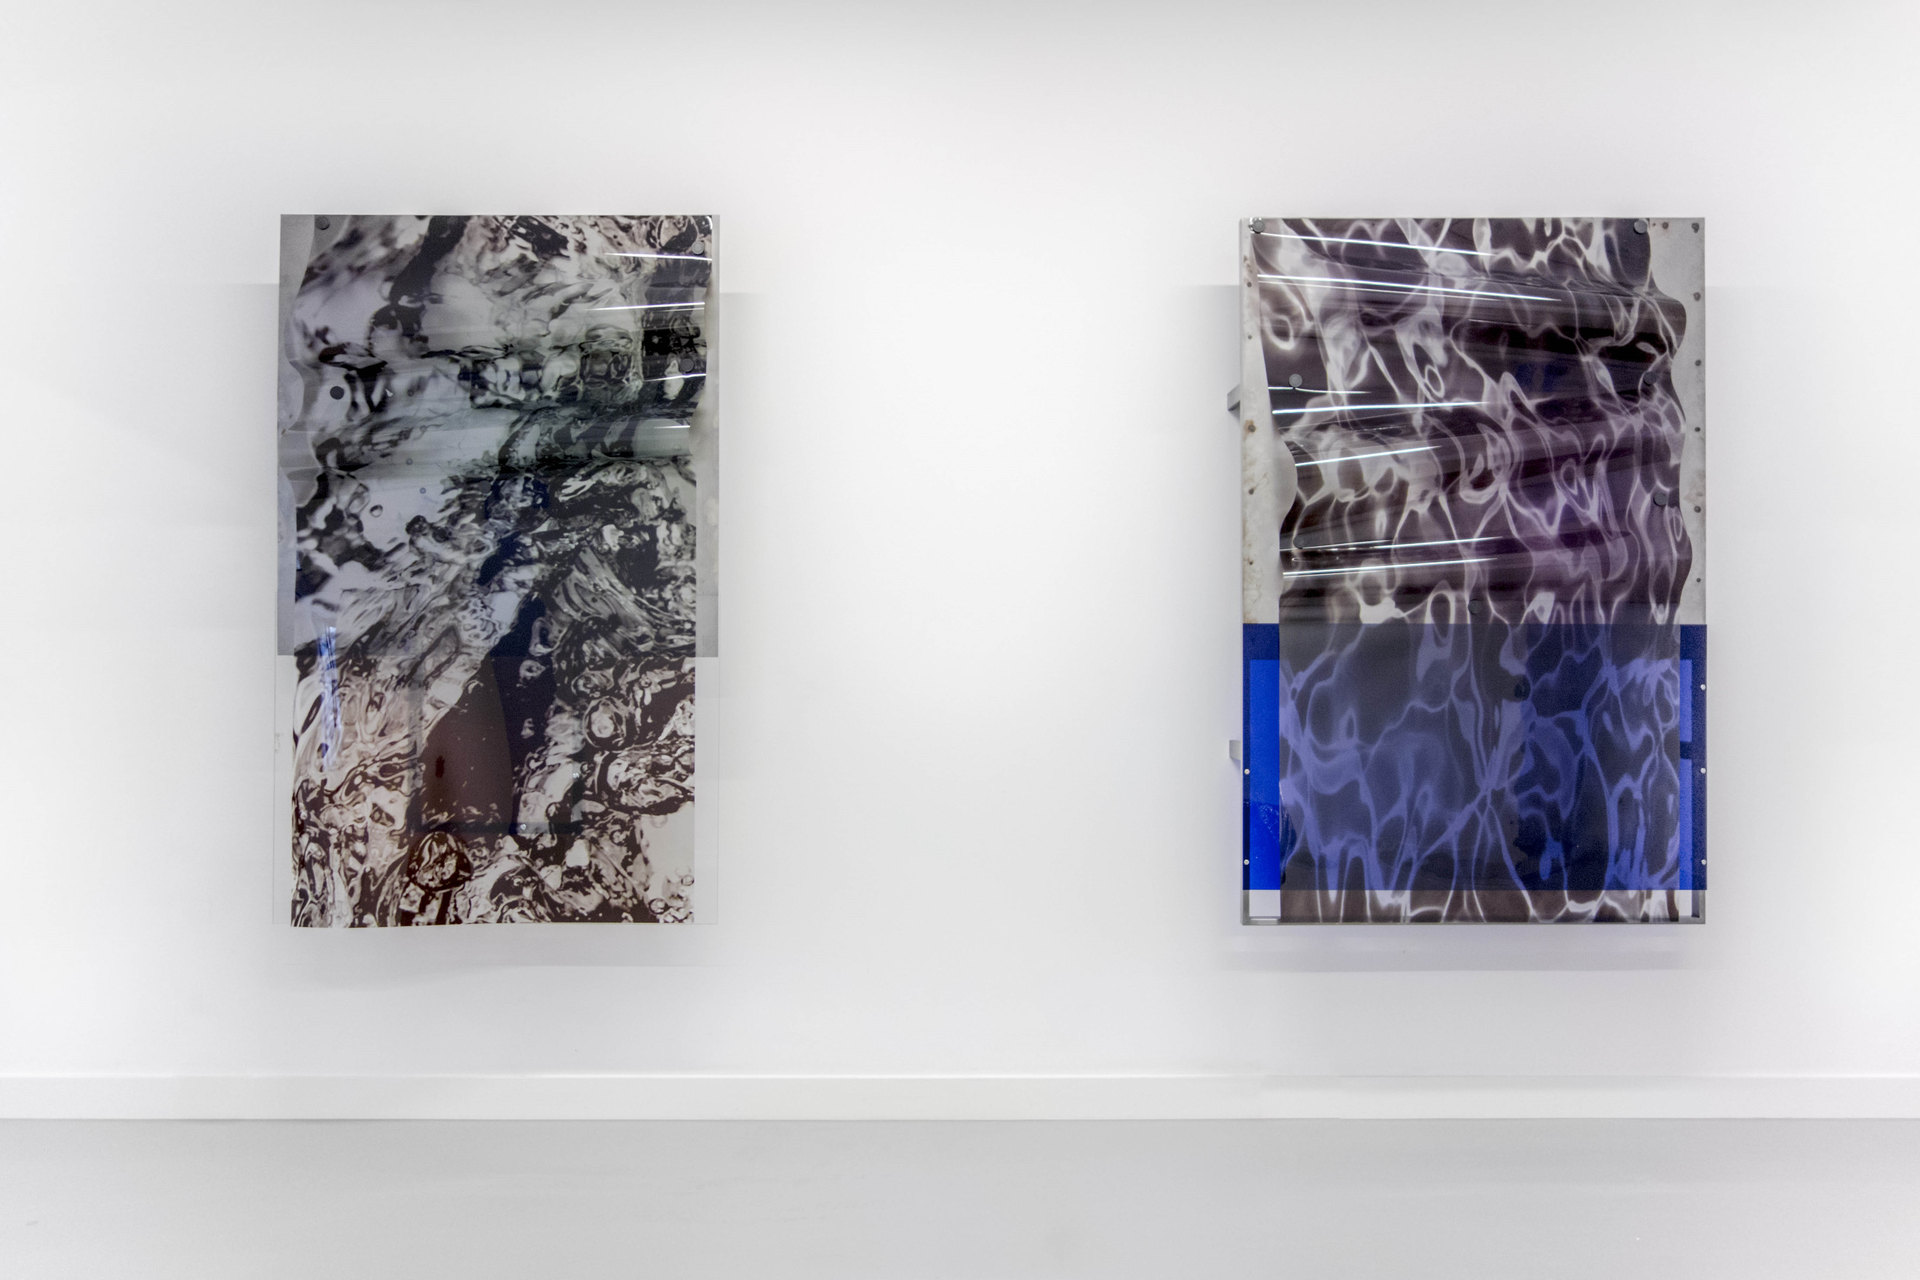 Thomas van Linge, Liquidity (no. 1 & 3), 2015, 160x100x25cm